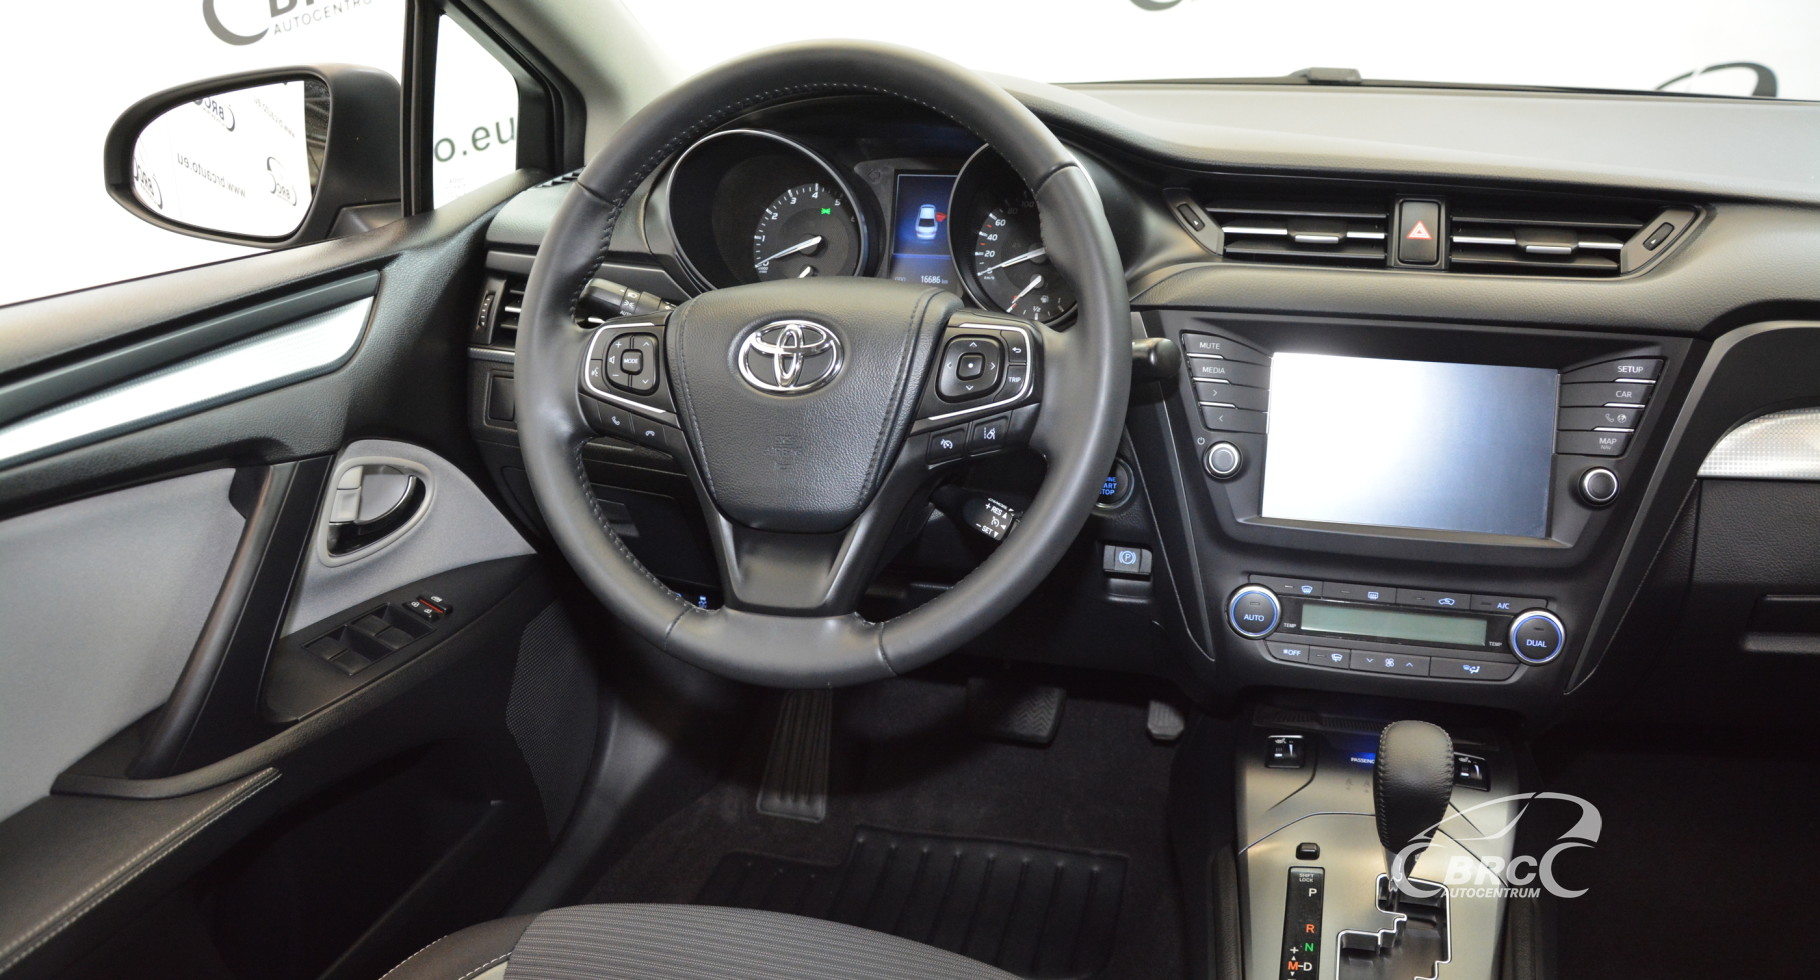 Toyota Avensis 1.8 Valvematic Active Automatas